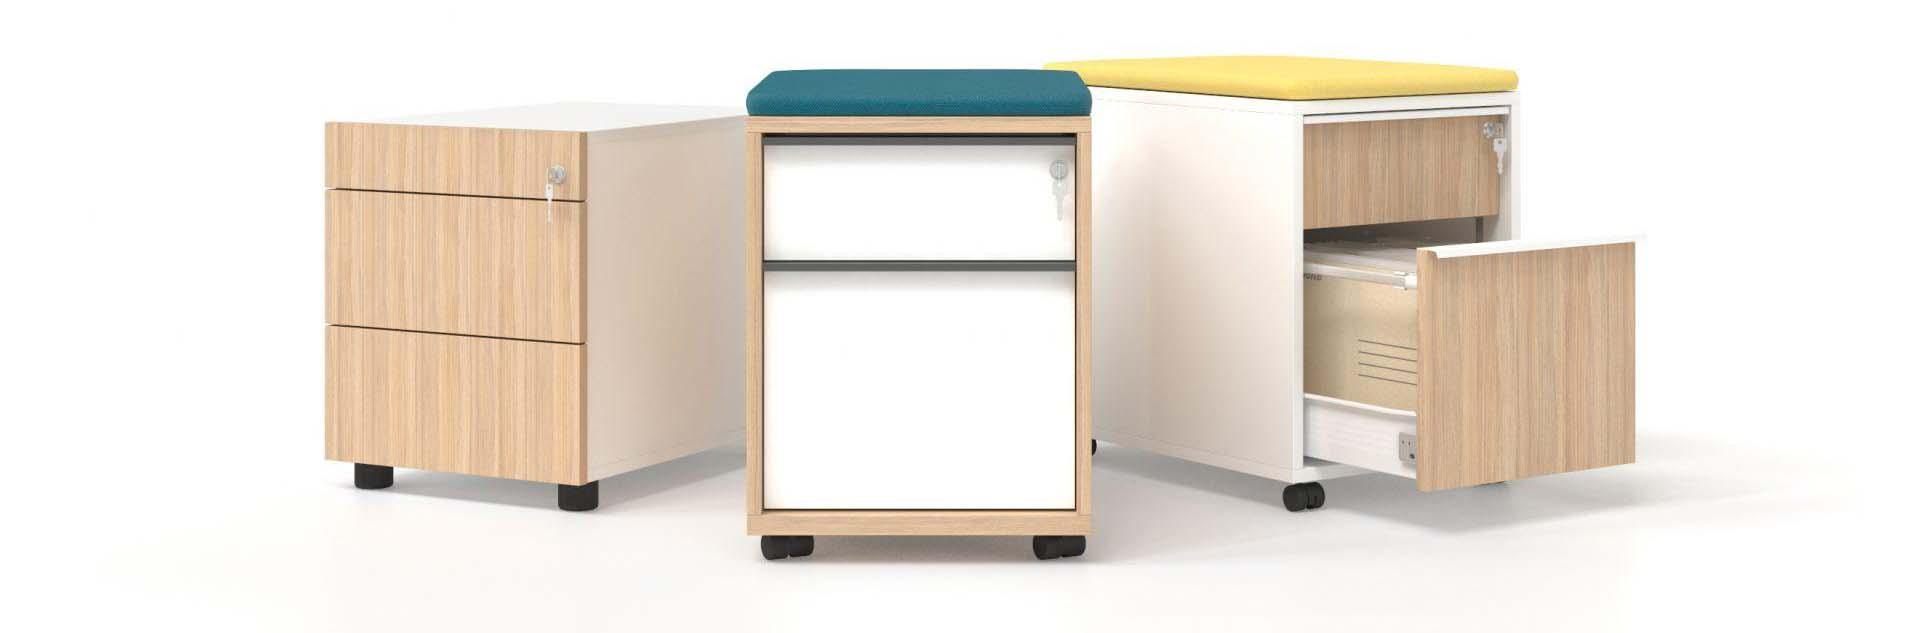 Storage-pedestals-NOVA-Narbutas-1-1920x1080